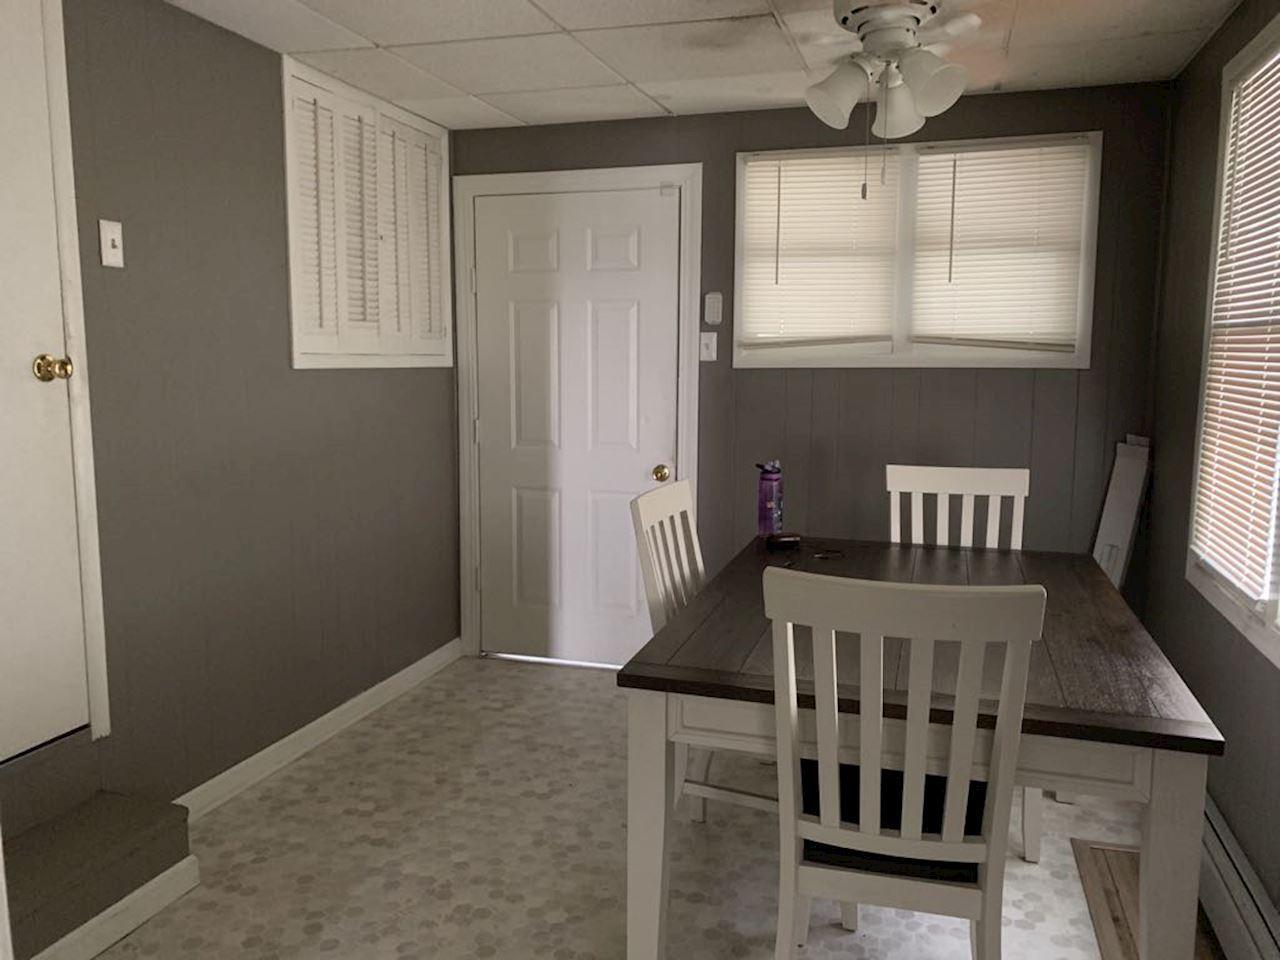 investment property - 142 Jackson St, Michigan City, IN 46360, La Porte - image 3